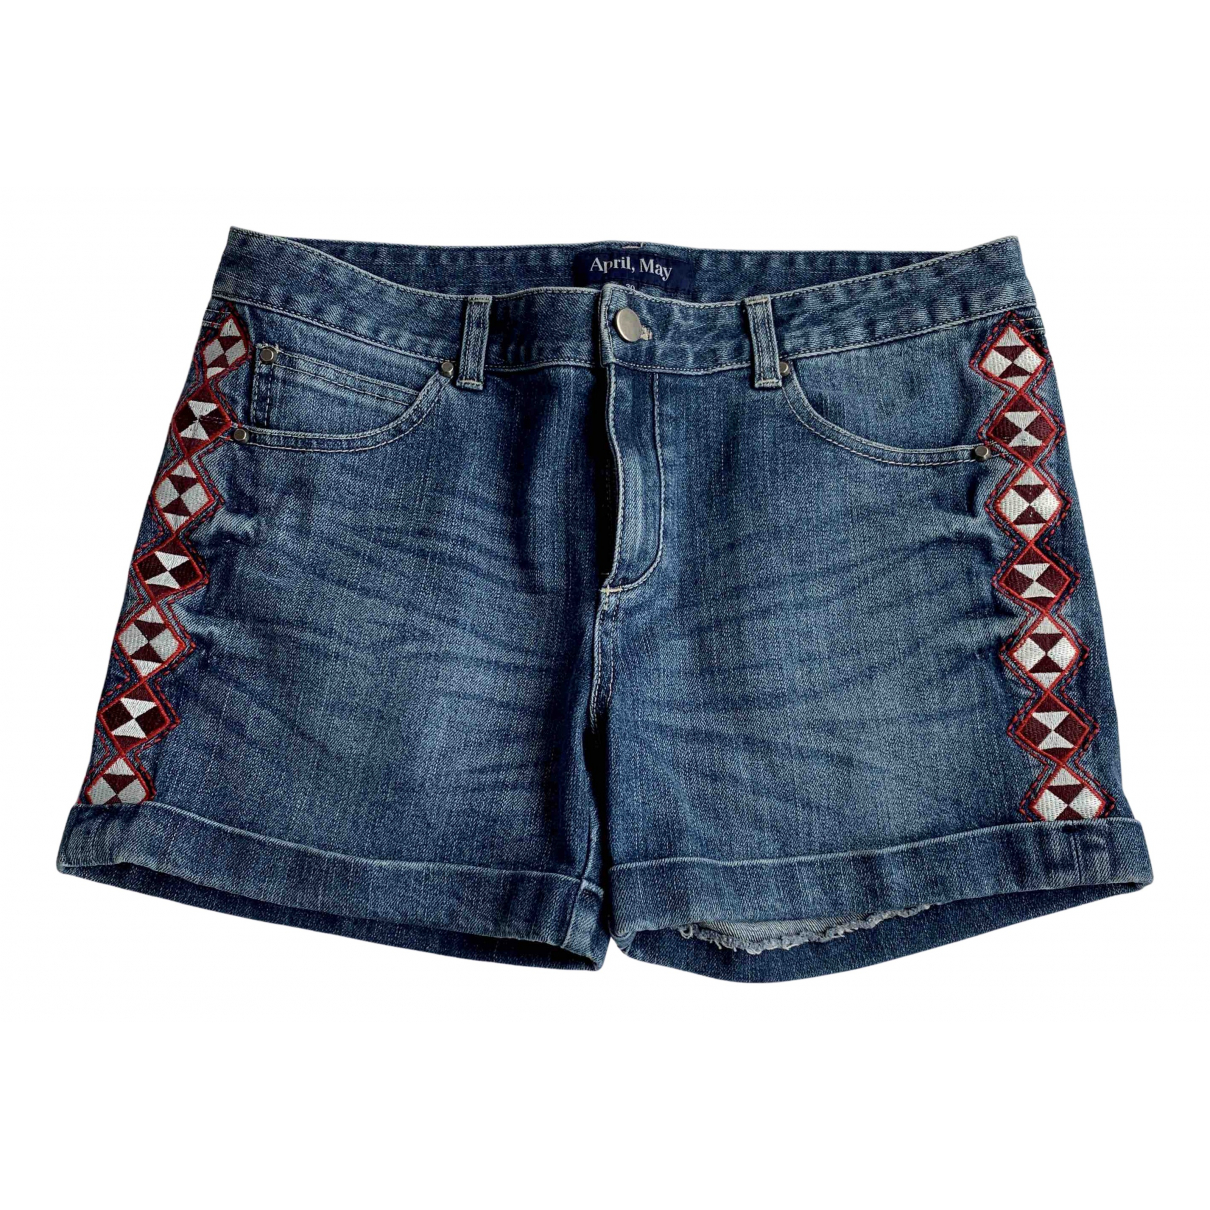 April May \N Shorts in  Blau Denim - Jeans